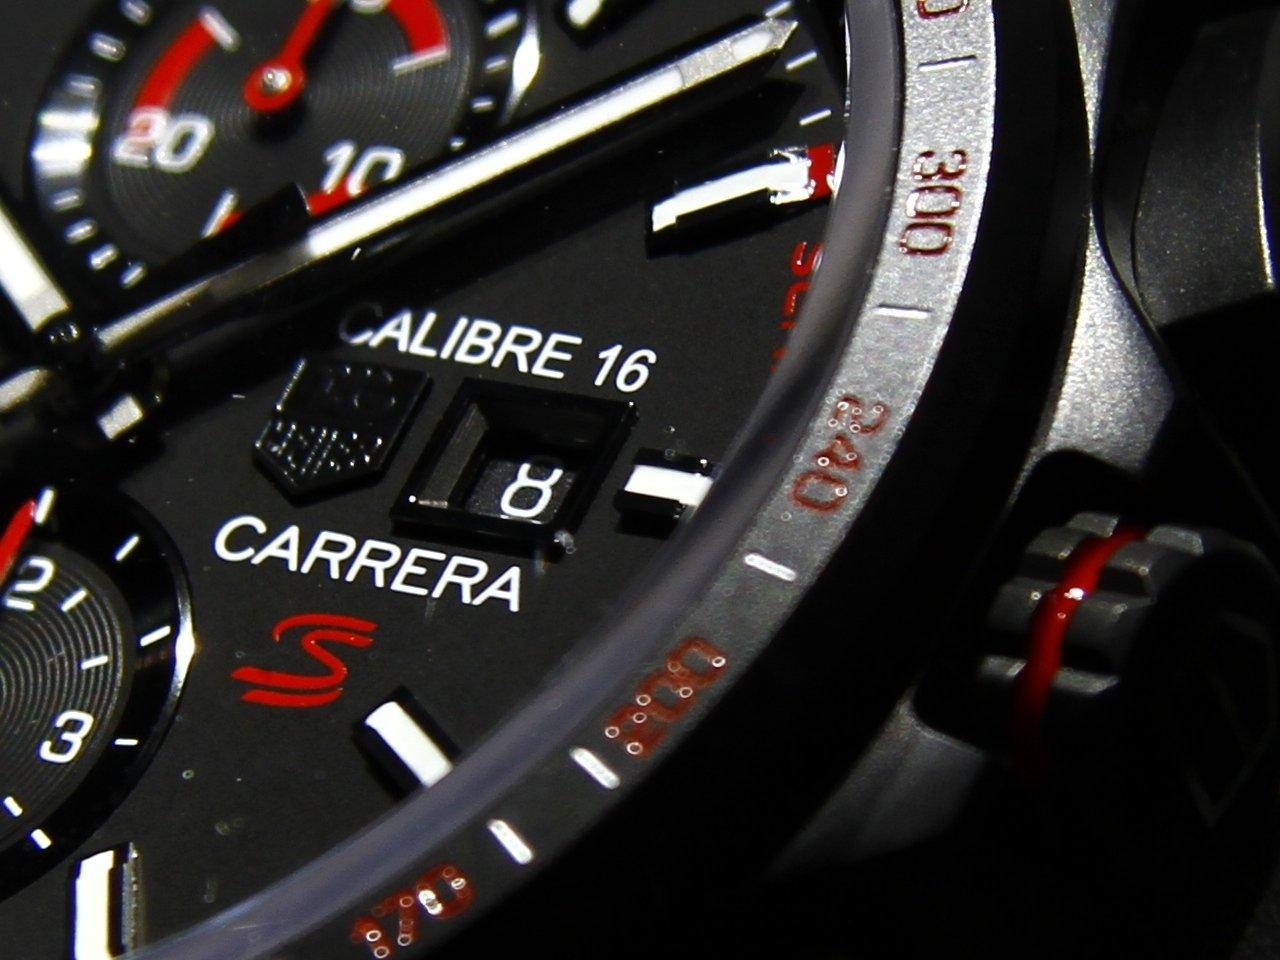 baselworld_2015-tag-heuer-calibre-16-chronograph-special-edition-senna-0-100_6